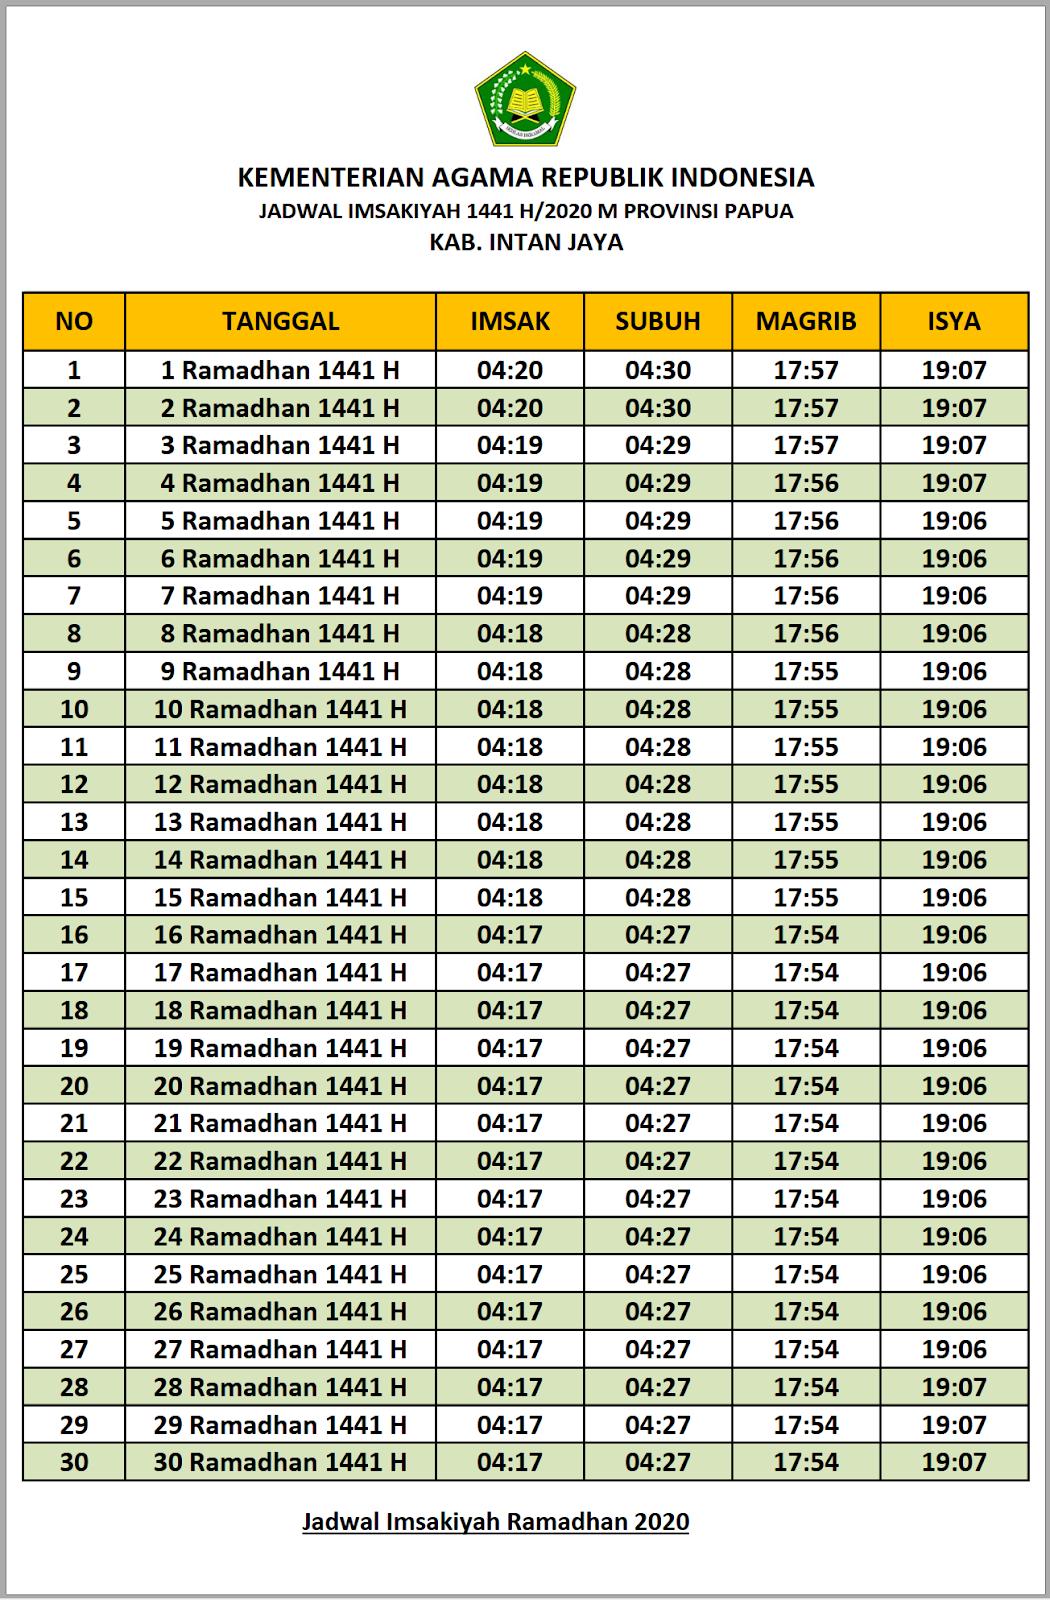 Jadwal Imsak Intan Jaya 2020